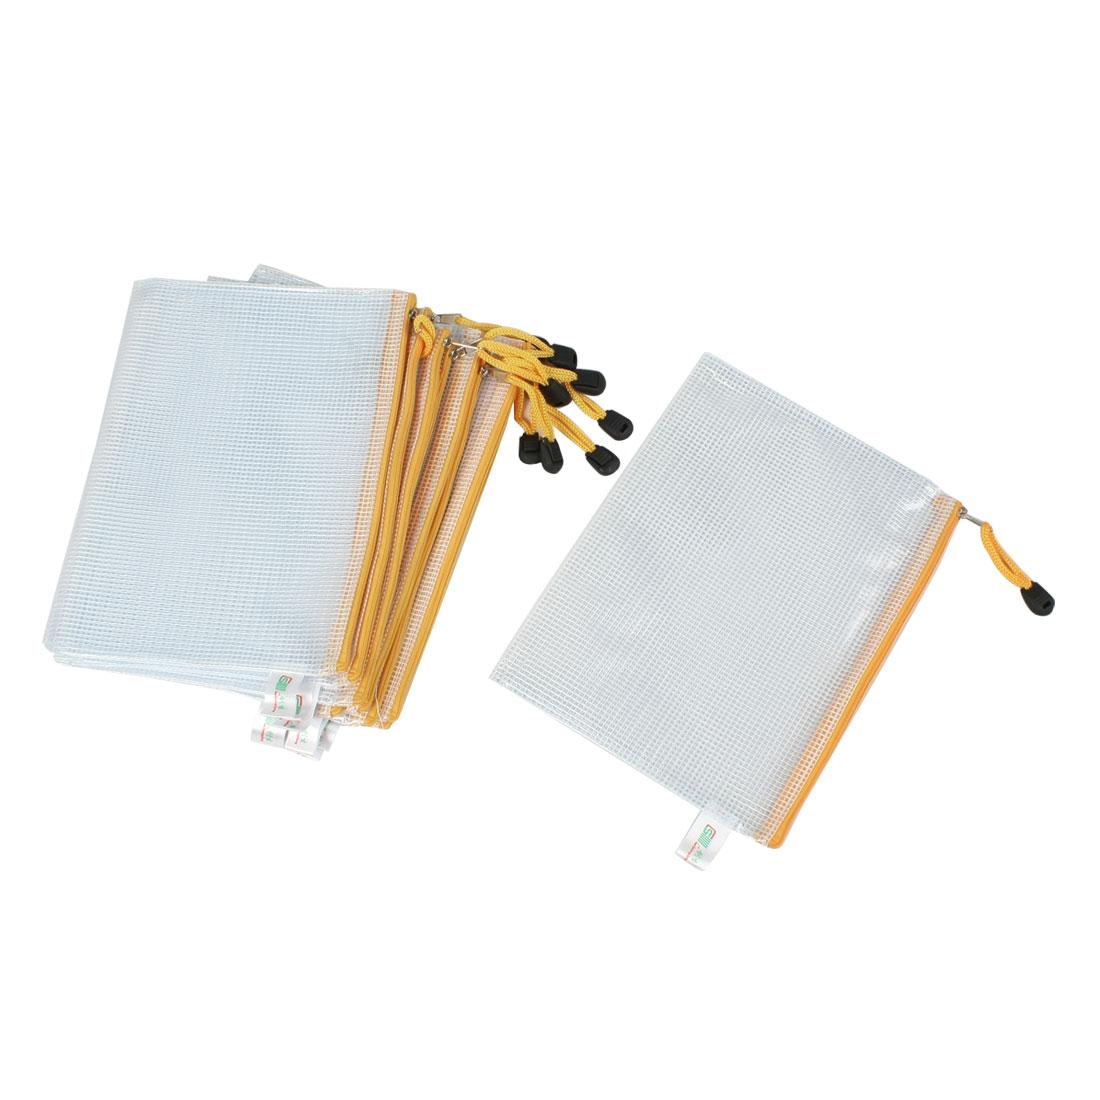 10 Pcs A5 Grid Yellow Zipper Closure File Folders Pocket Clear